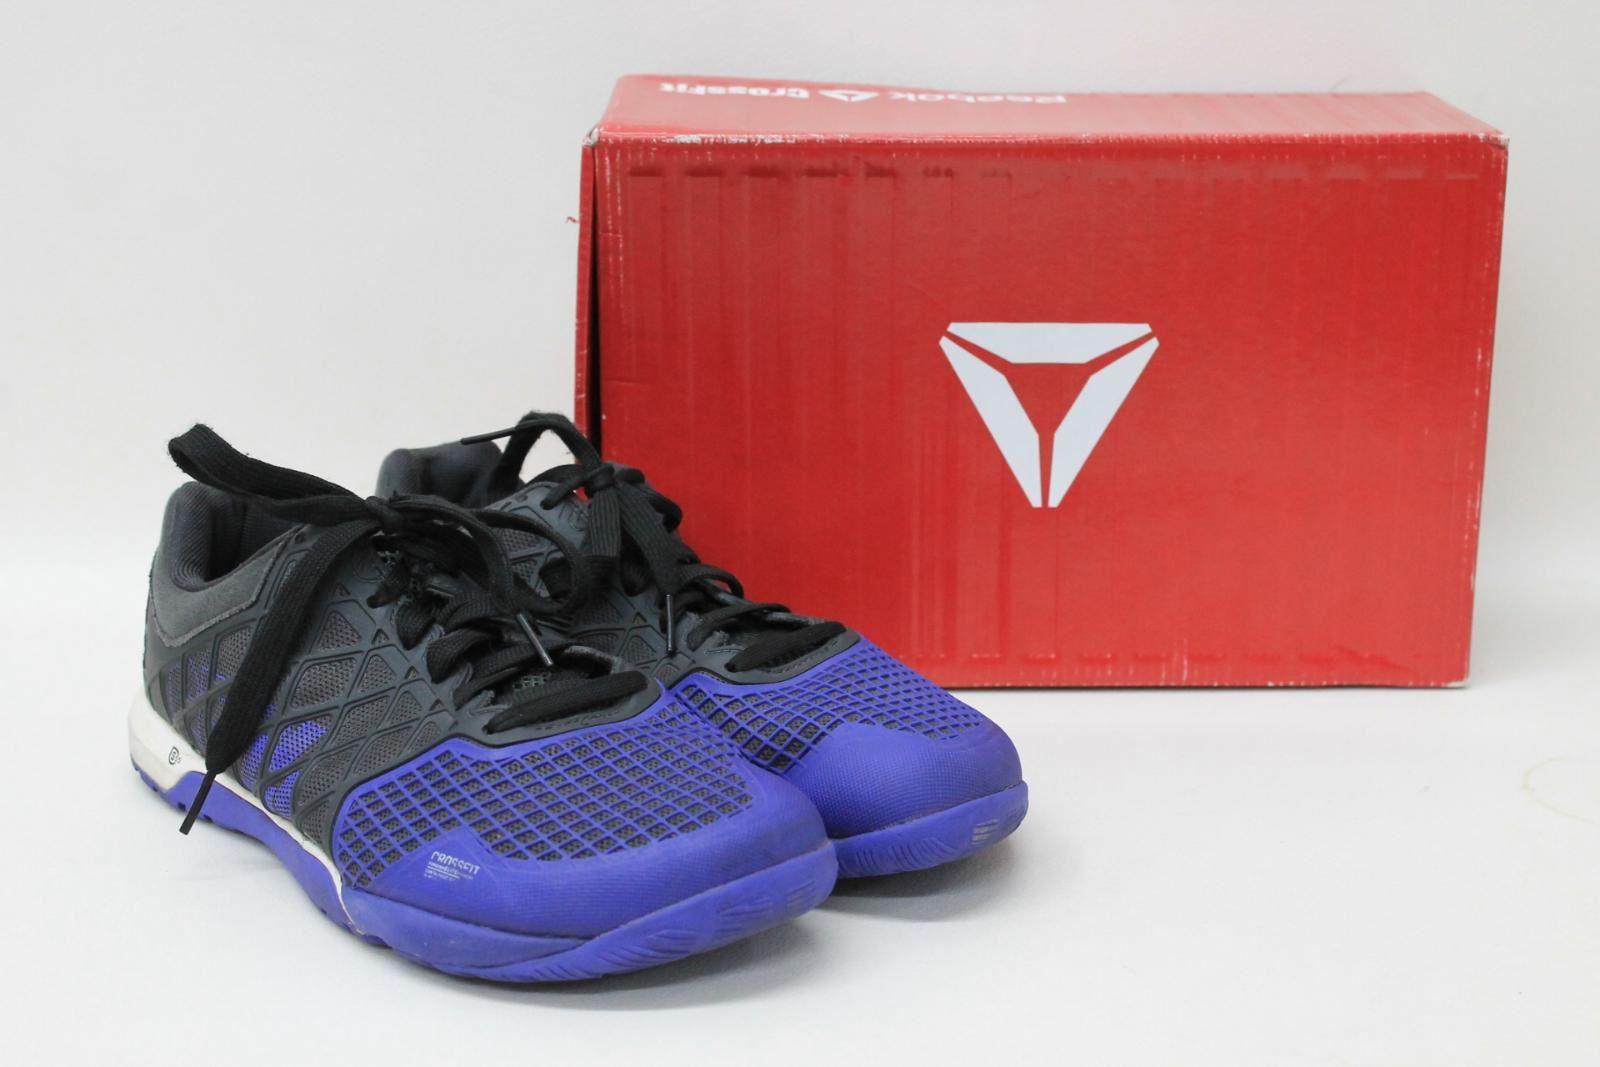 REEBOK Men s CrossFit Nano 3.0 Black Purple Training Trainers Shoes ... d81359804